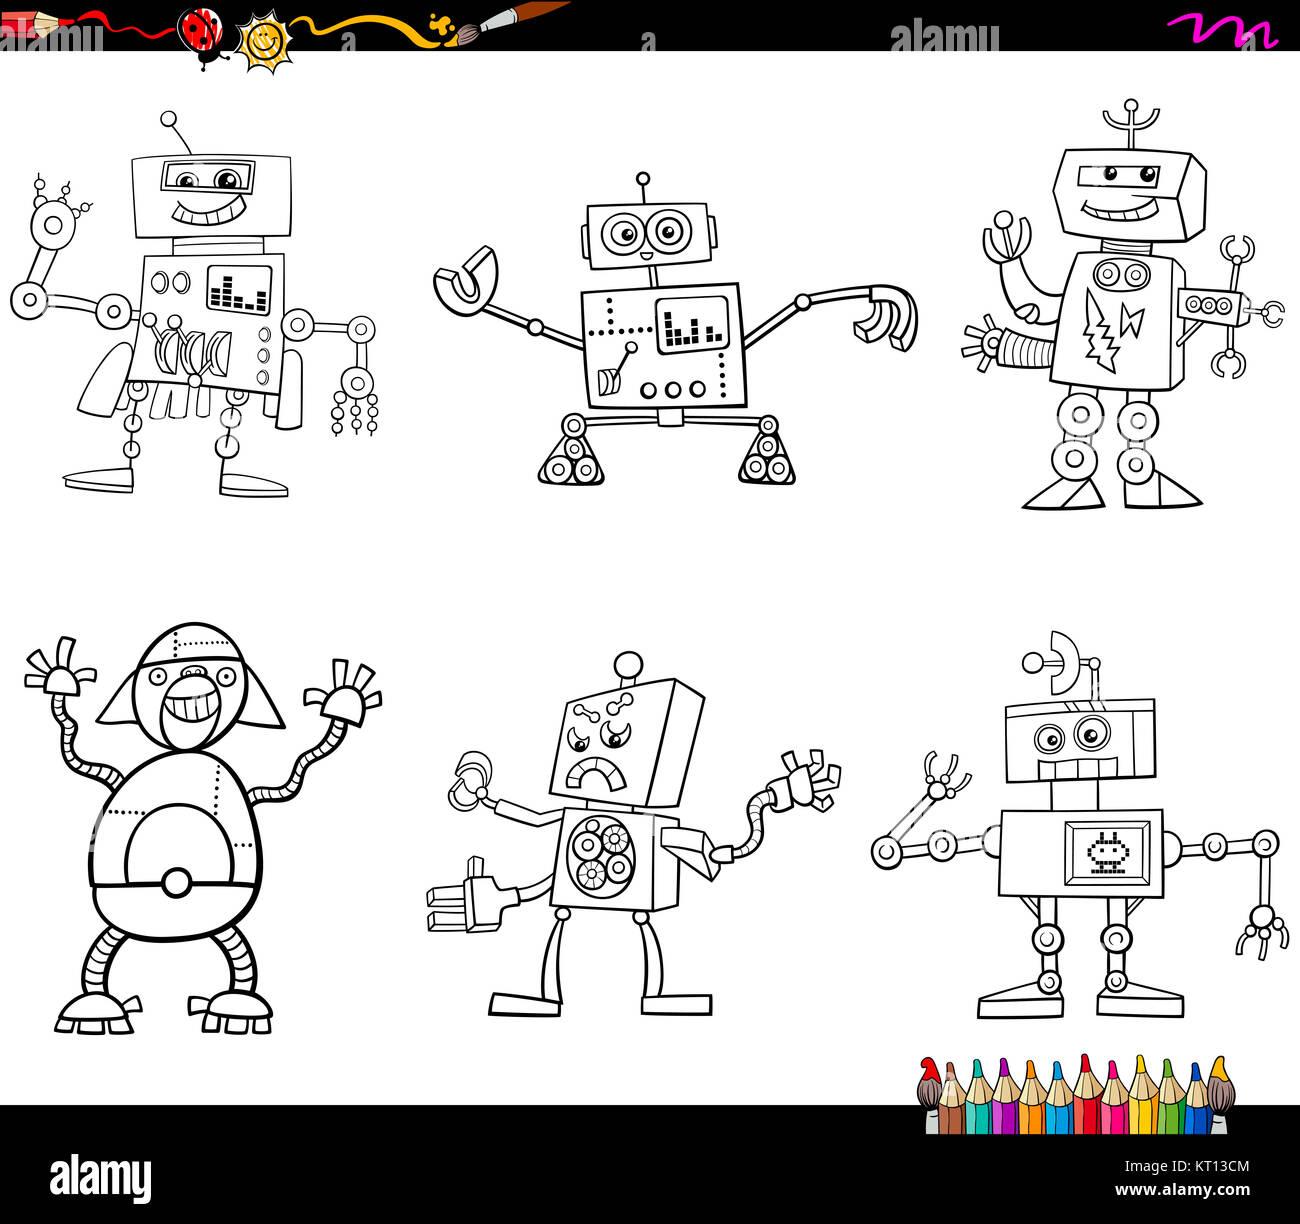 Fantasy Characters Coloring Page Stockfotos & Fantasy Characters ...